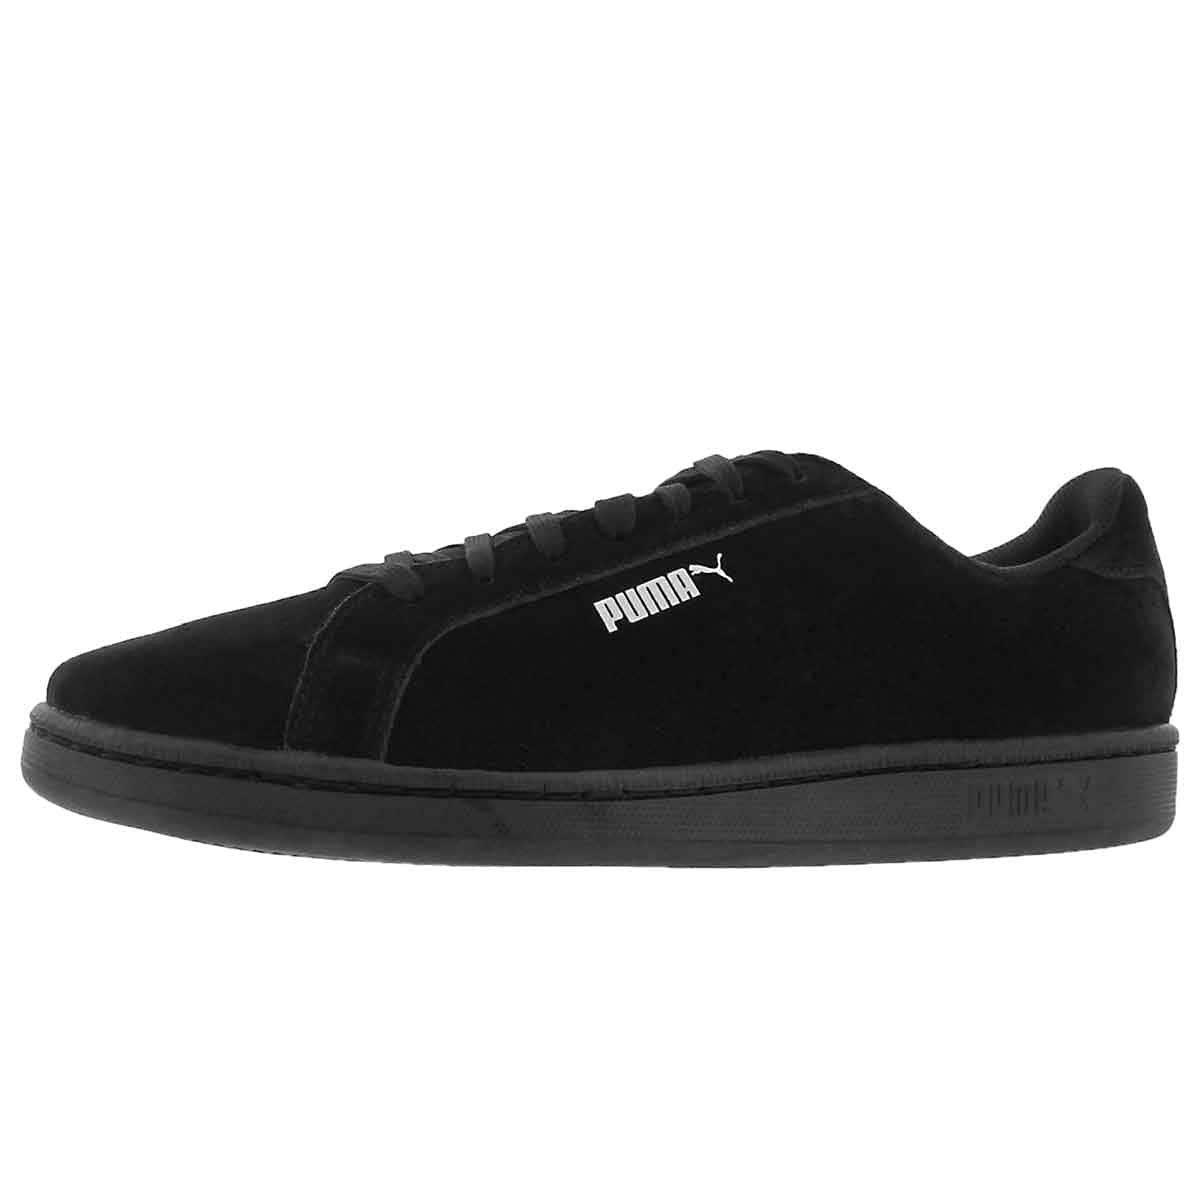 PUMA Men's Smash SD Fashion Sneaker (9.5 D(M) US, Black)